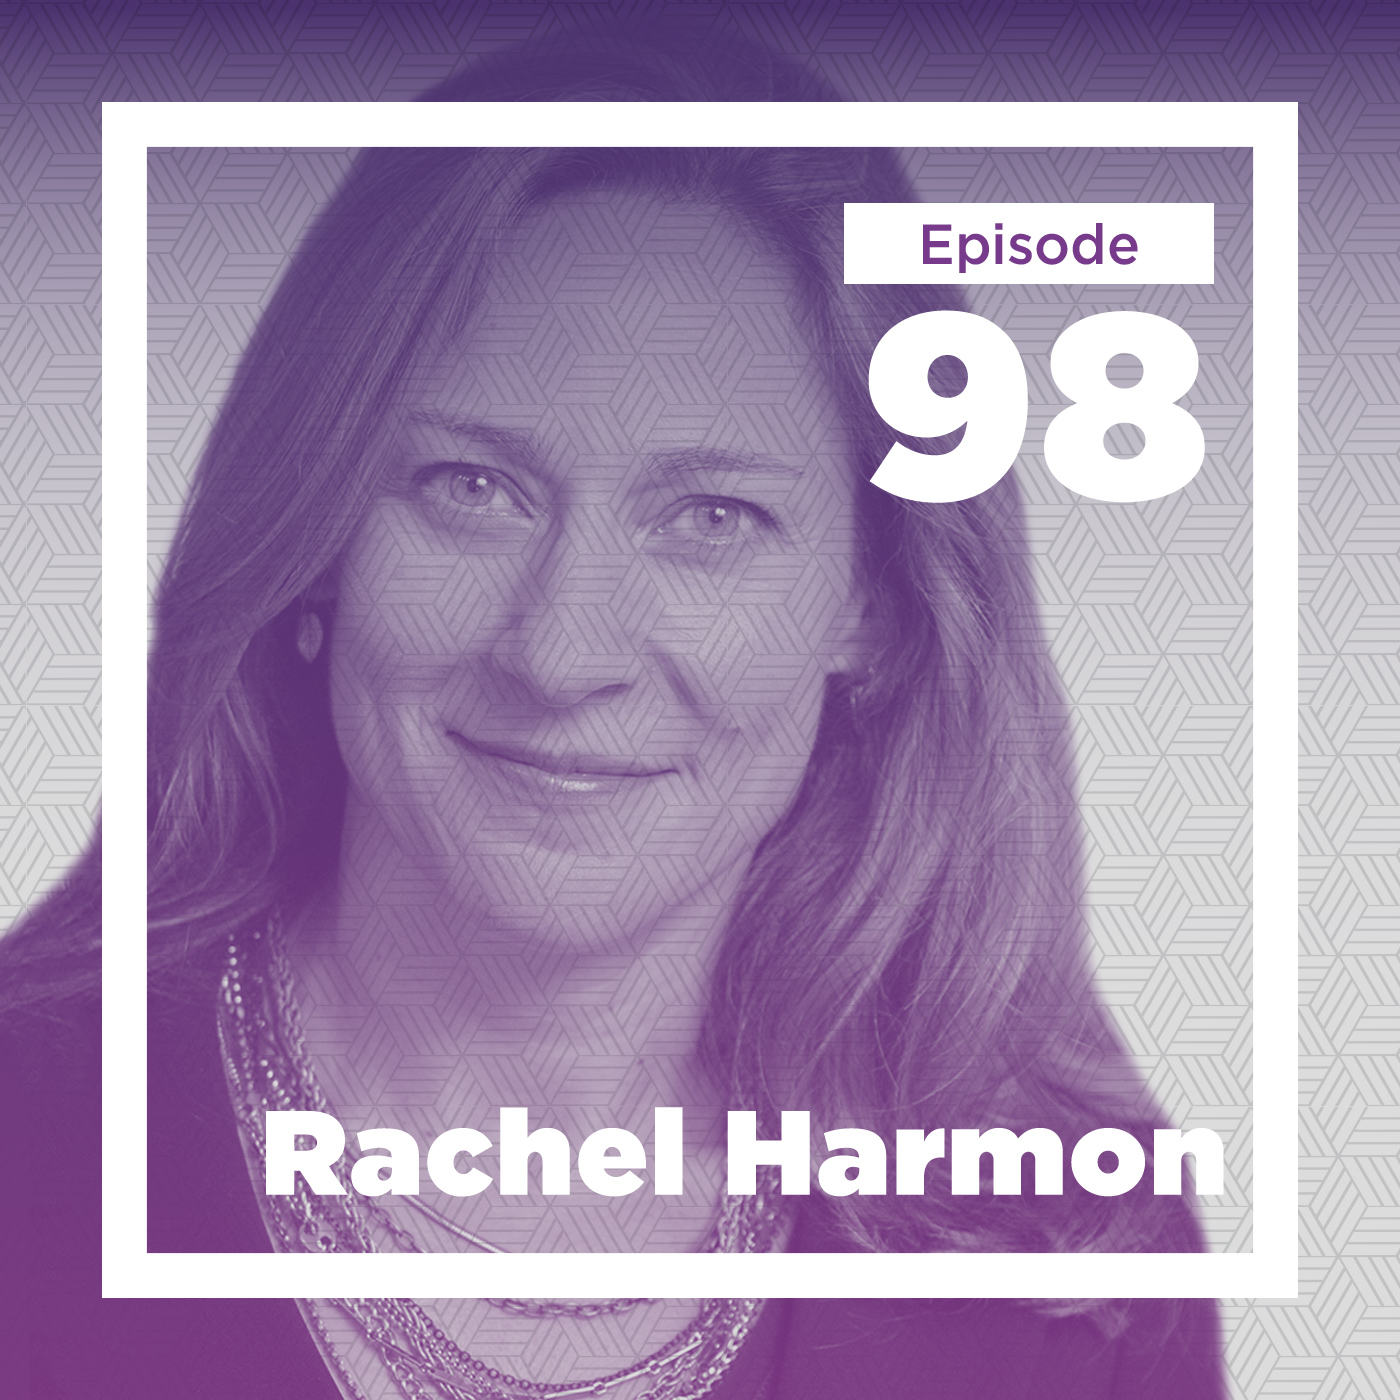 Rachel Harmon on Policing